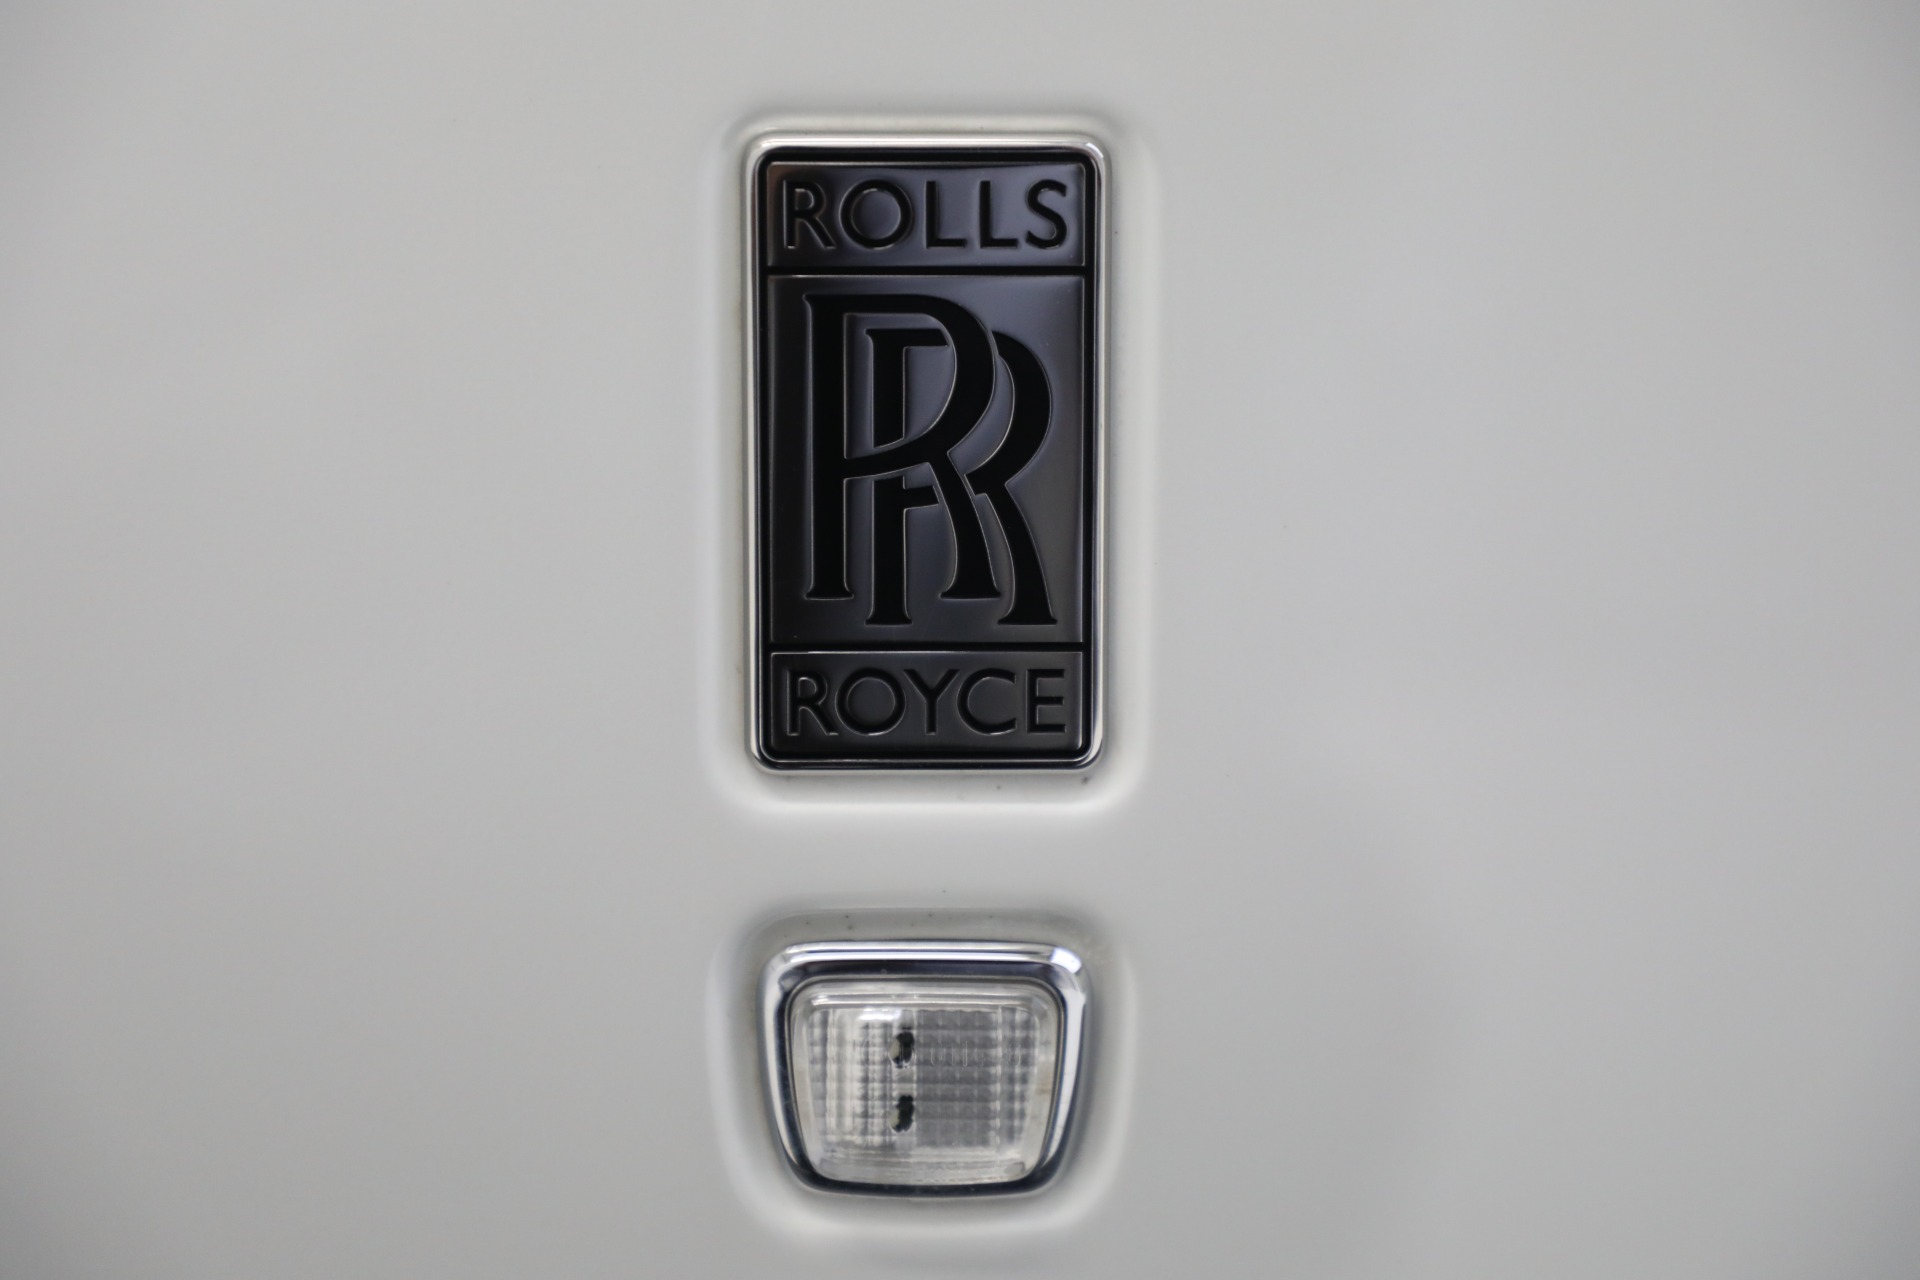 Used 2017 Rolls Royce Phantom Drophead Coupe